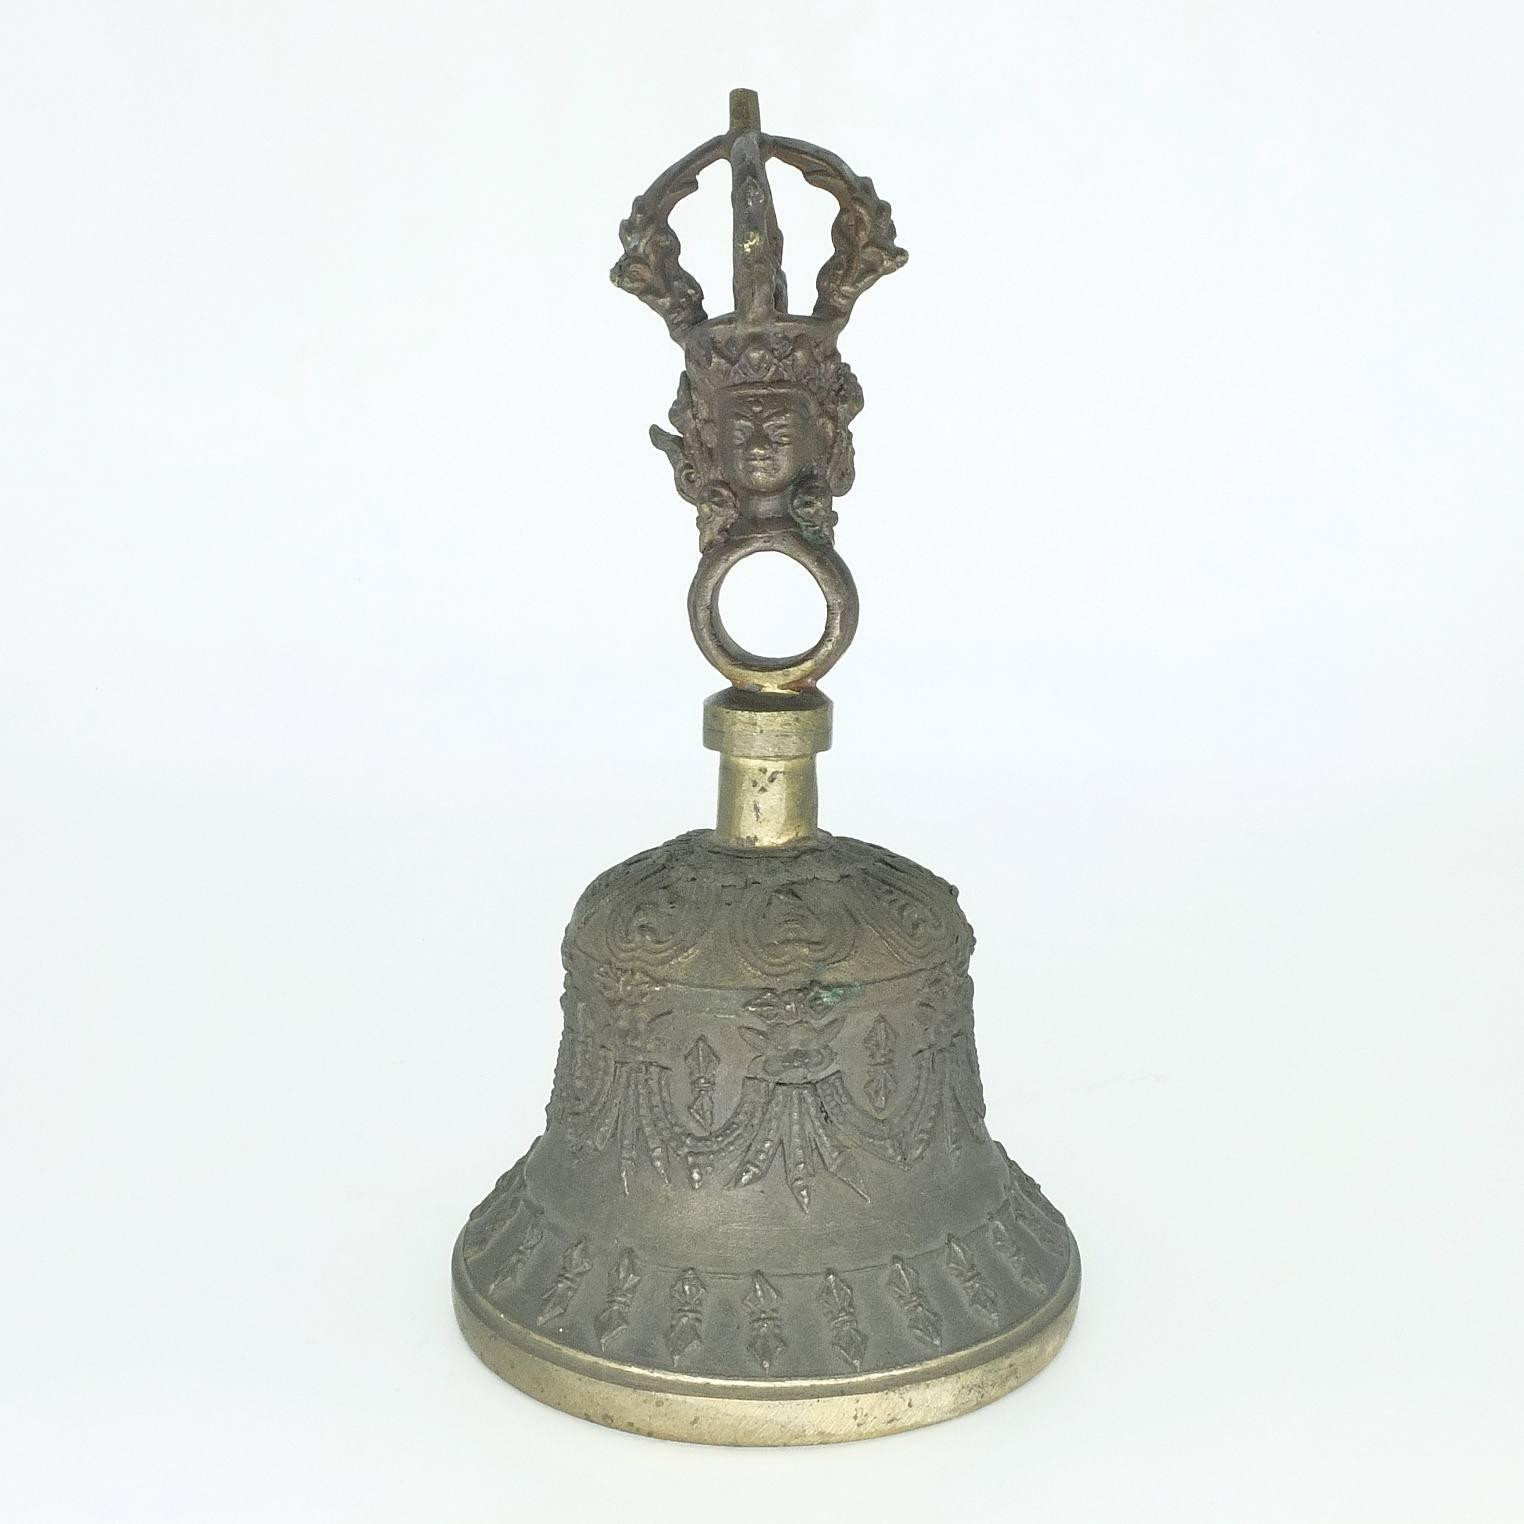 'Tibetan Ritual Bell'